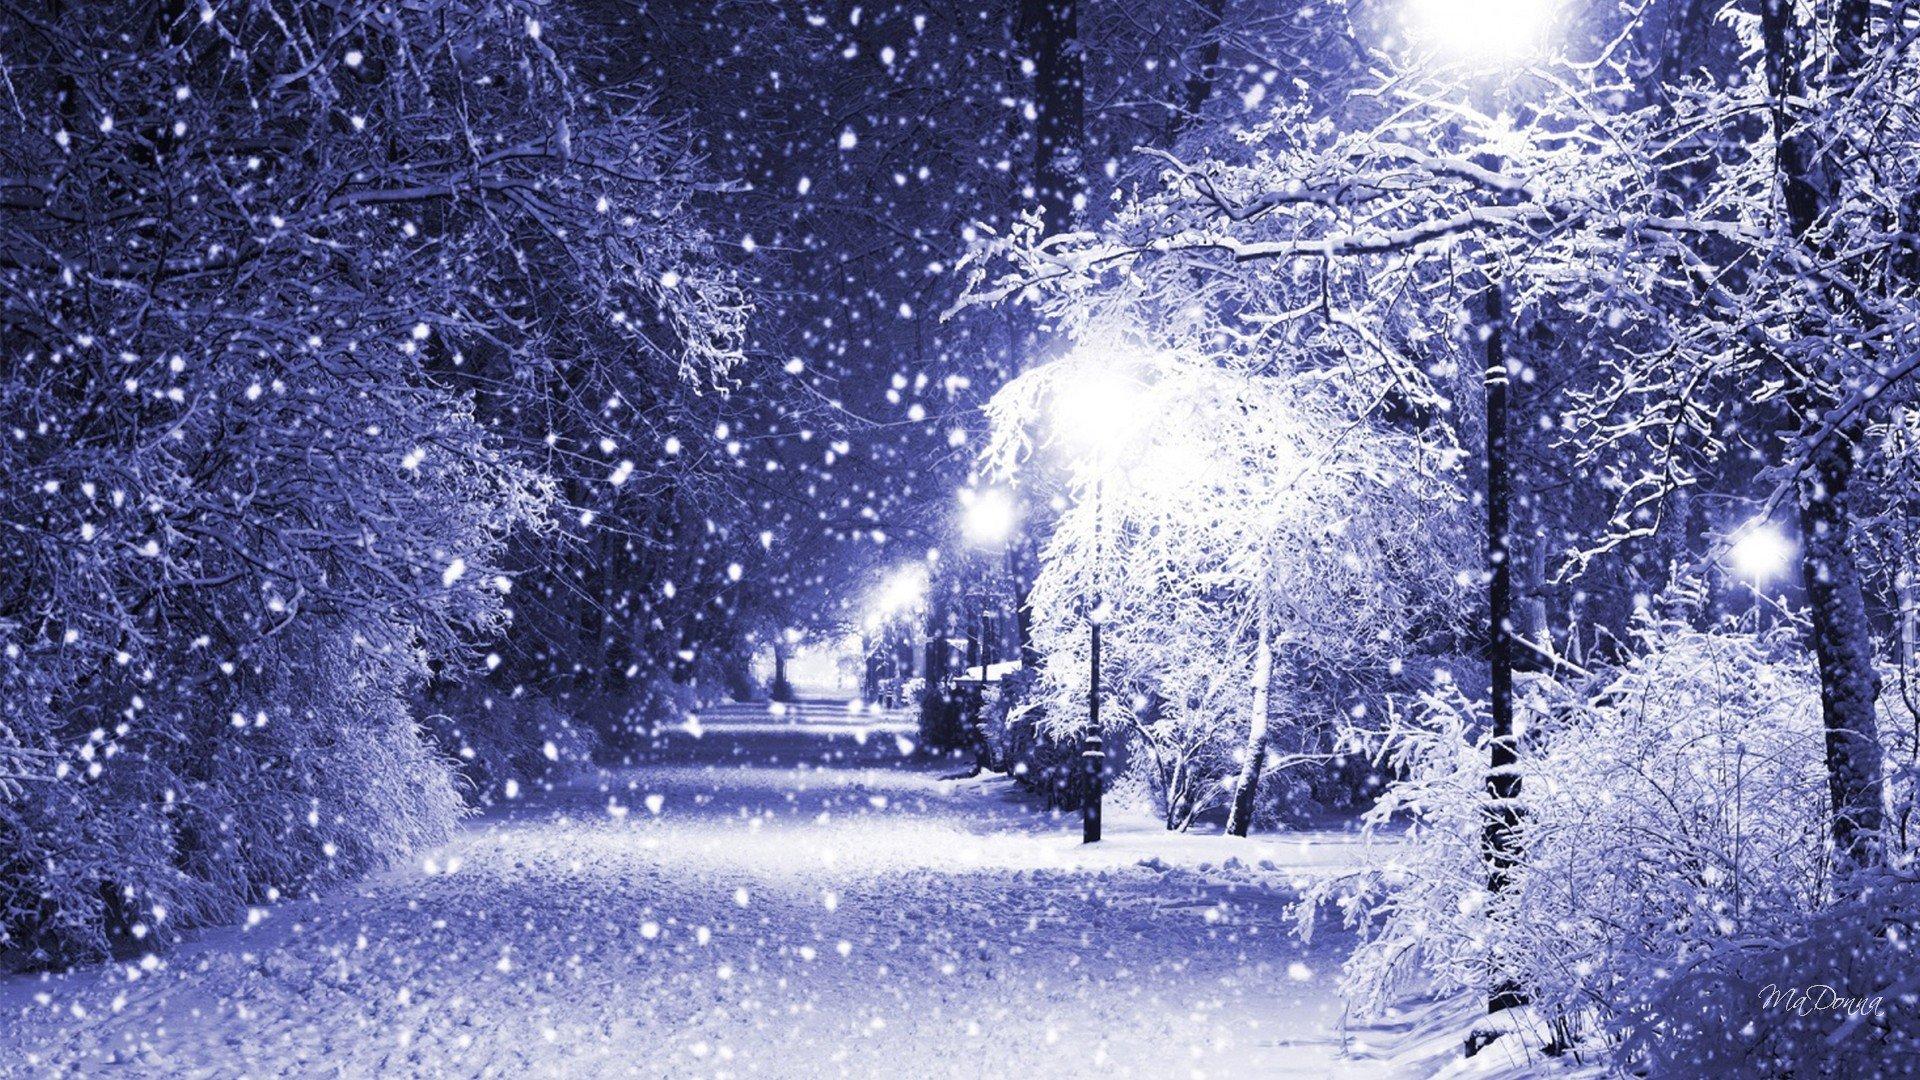 Seams to be a christmas night hd wallpaper - Christmas nature wallpaper ...